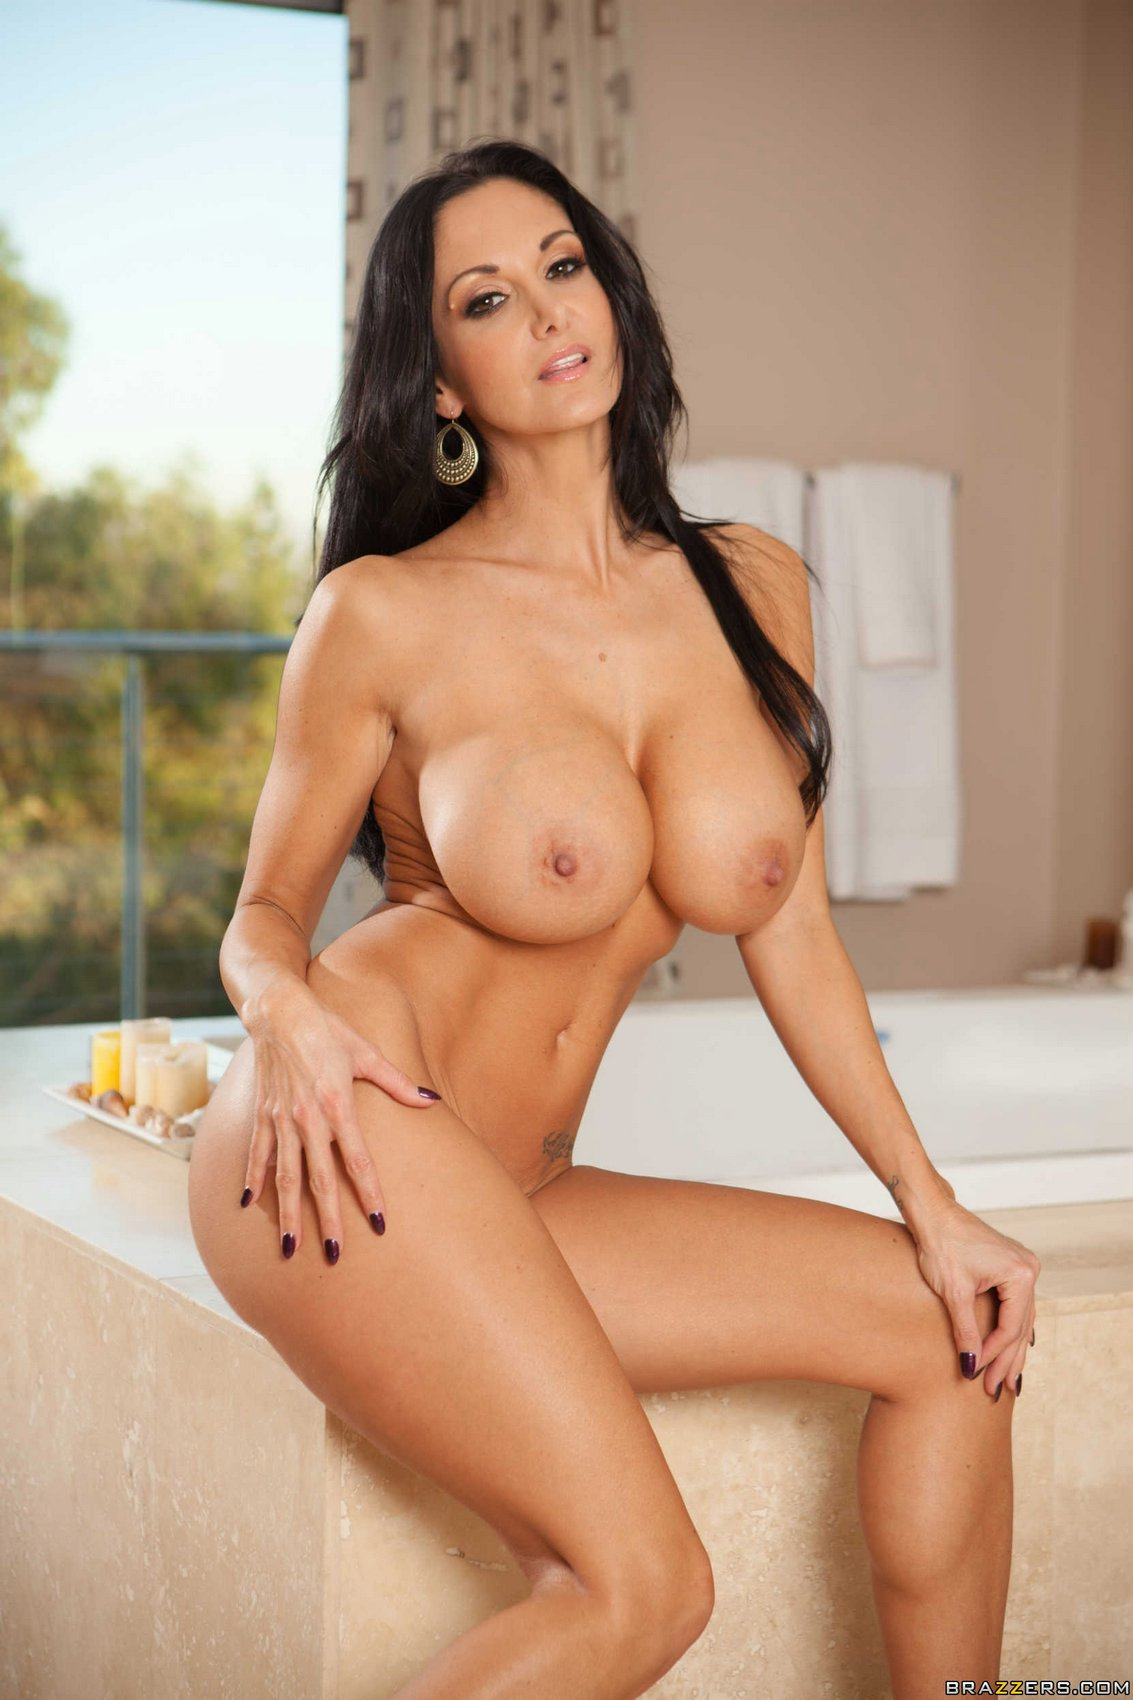 Ava addams sexy nude can